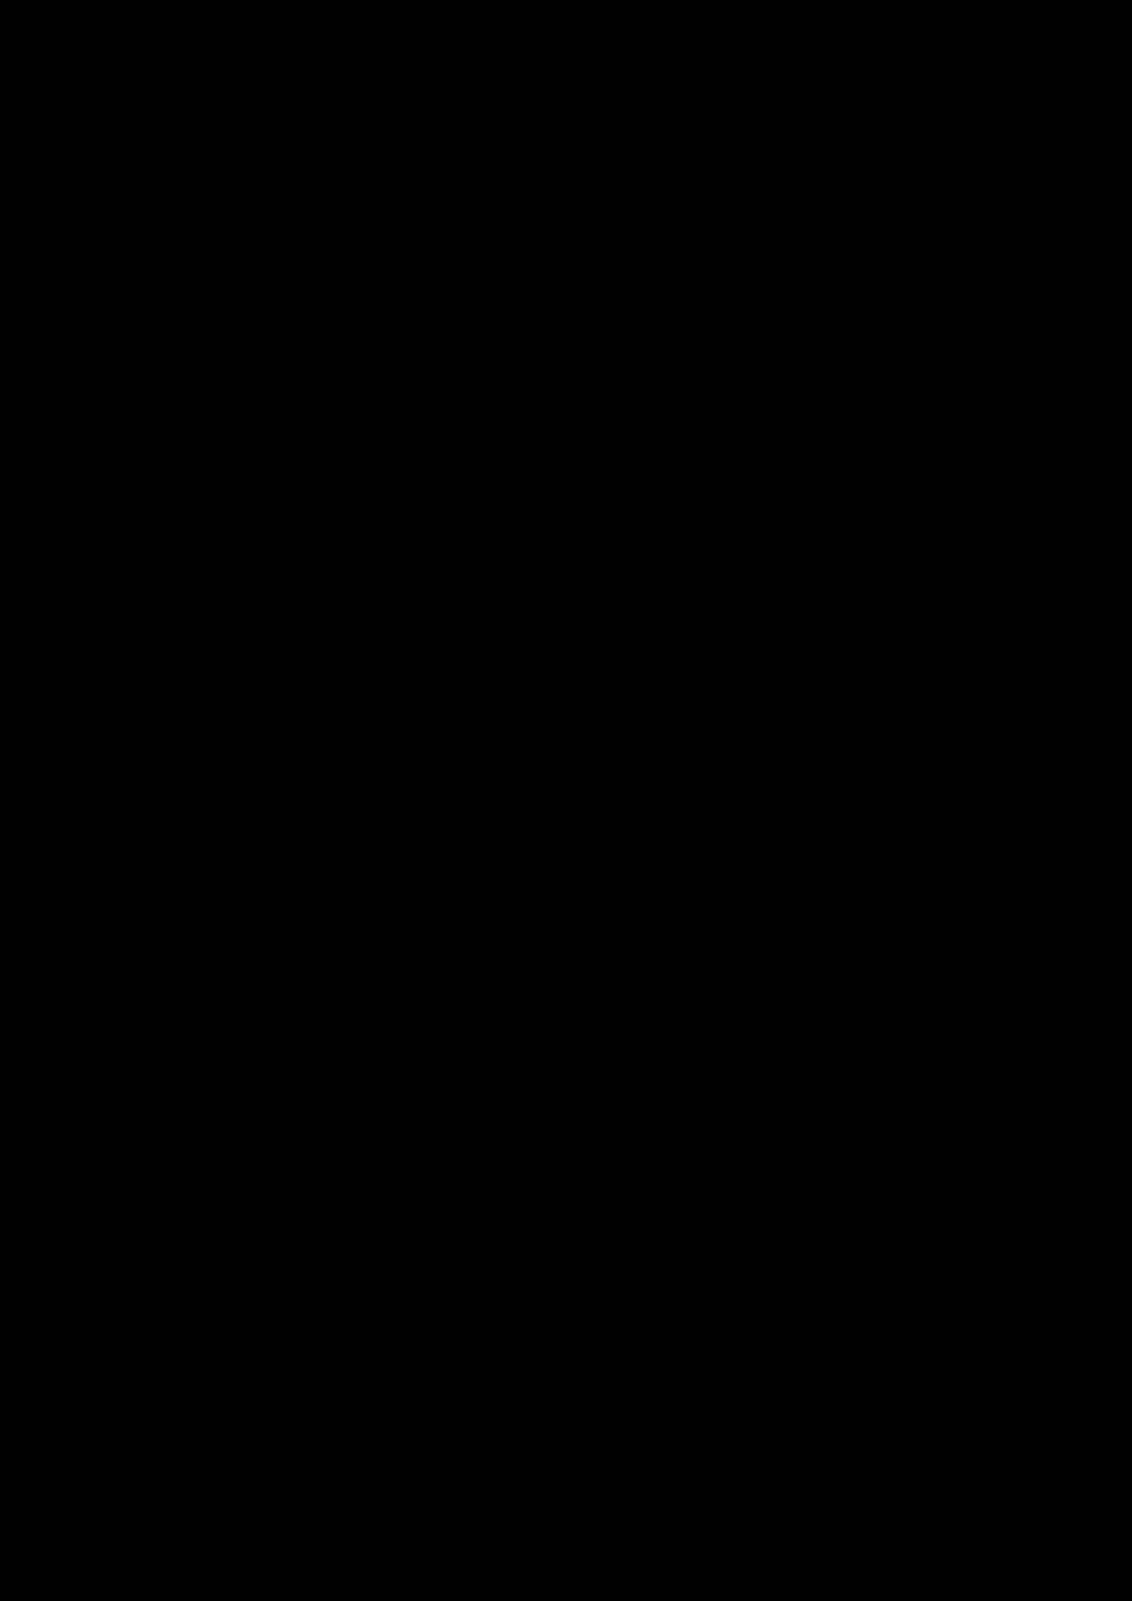 Korolevstvo slez slide, Image 21